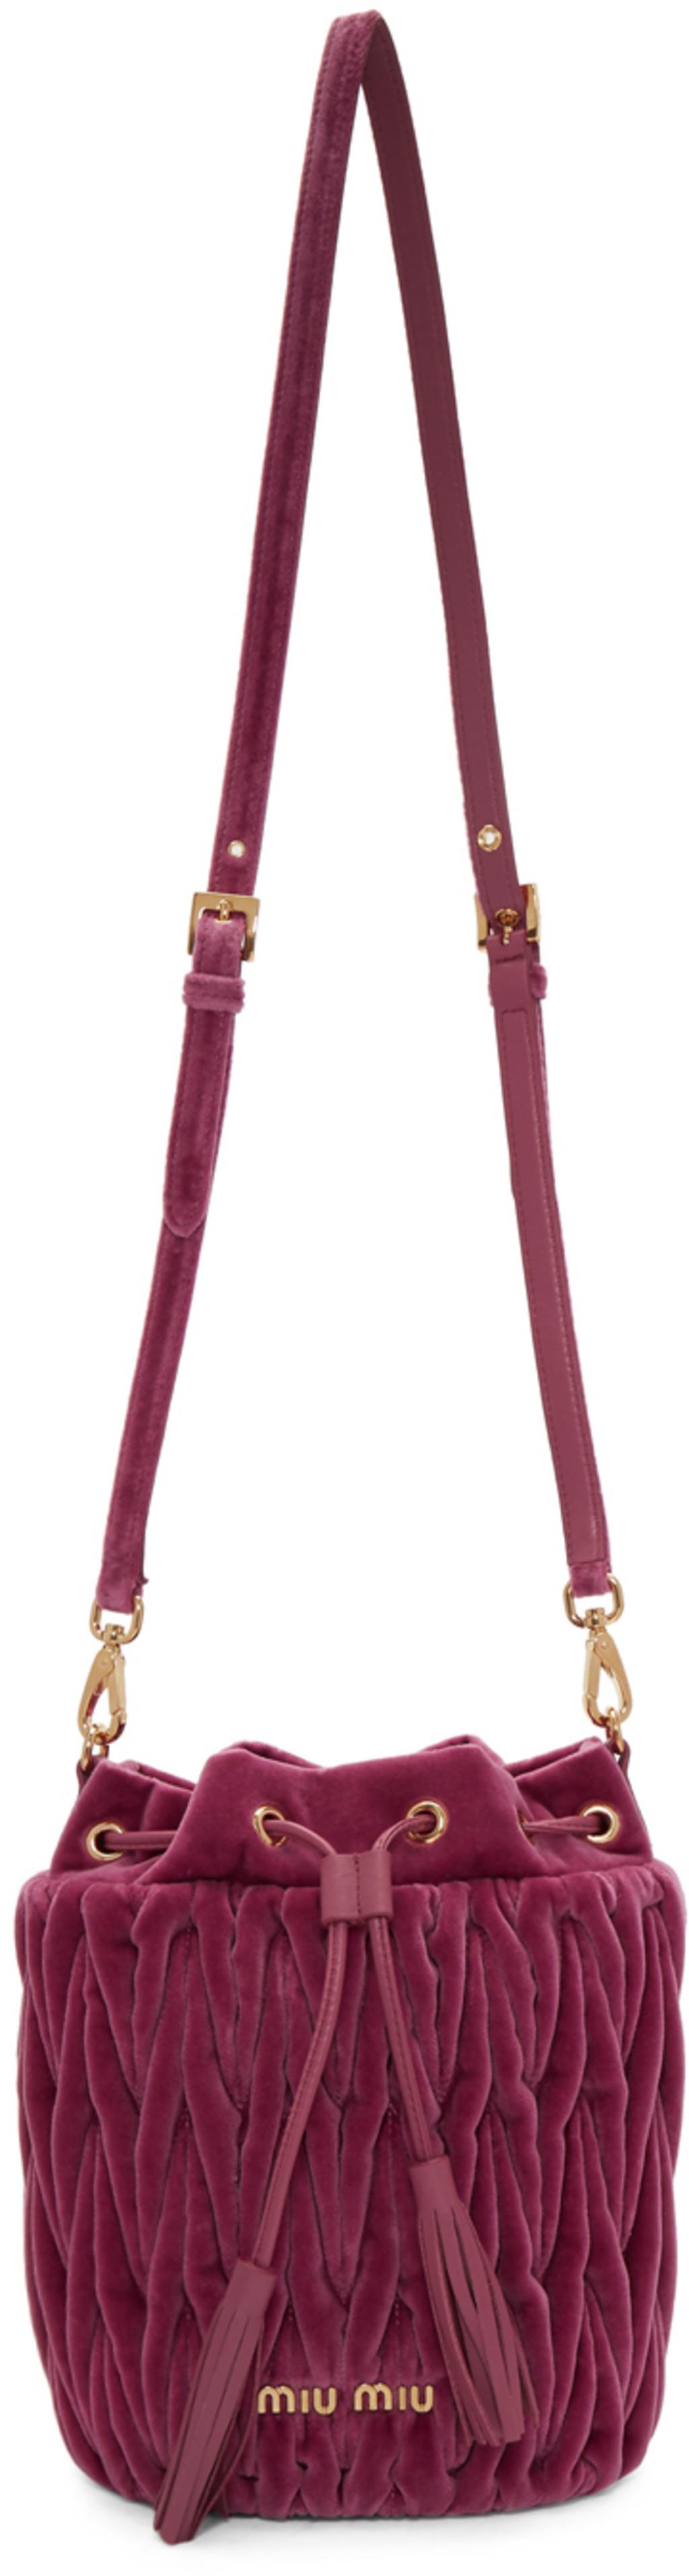 Miu Miu bags for Women  e81cc920fed33